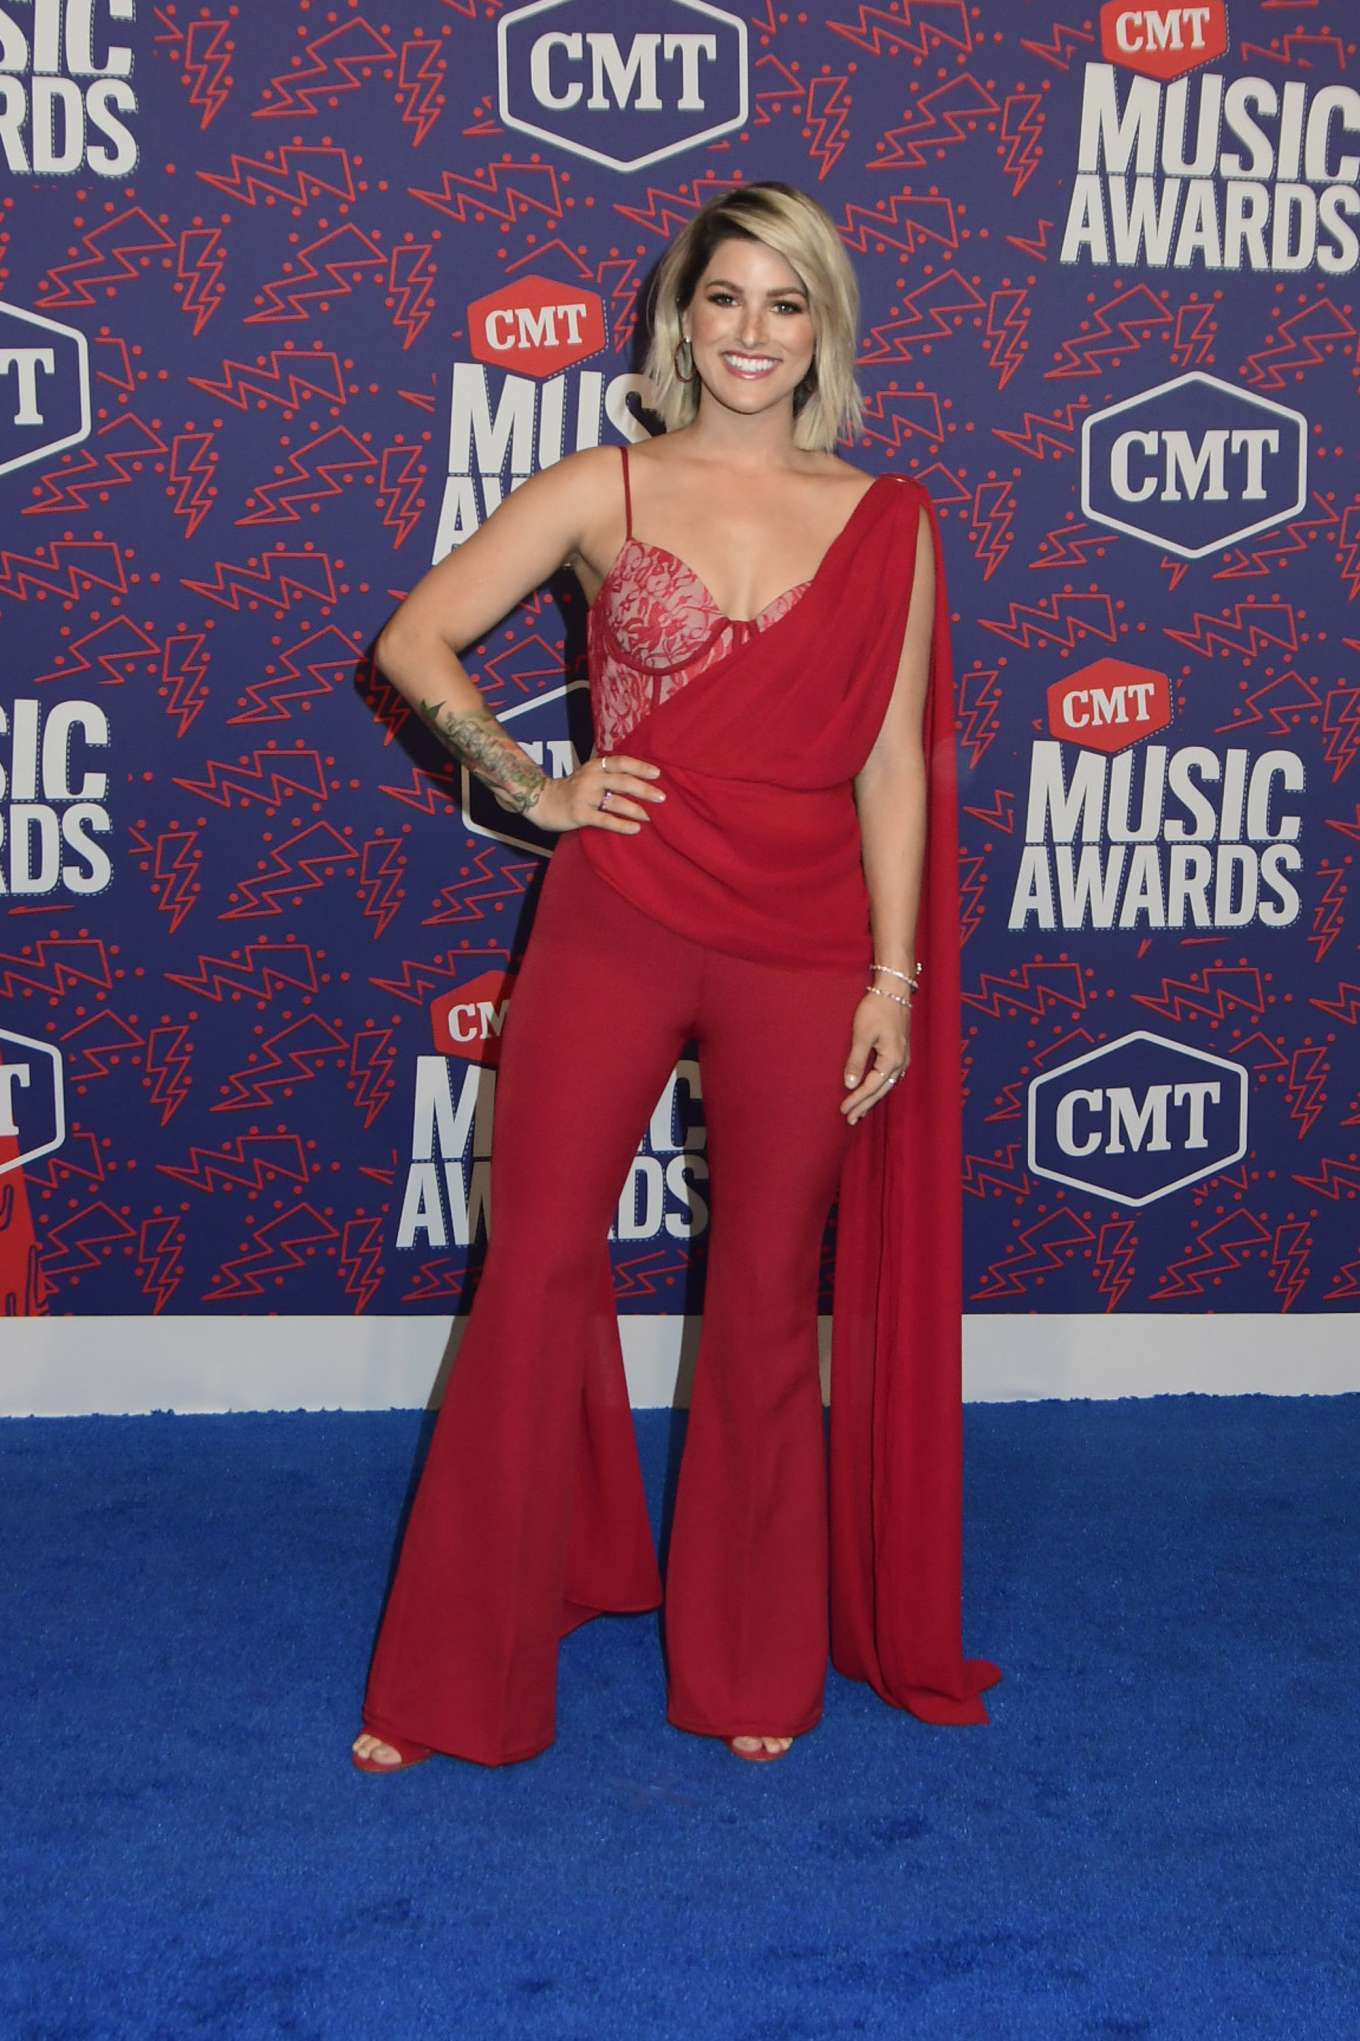 Cassadee Pope 2019 : Cassadee Pope: 2019 CMT Music Awards-07